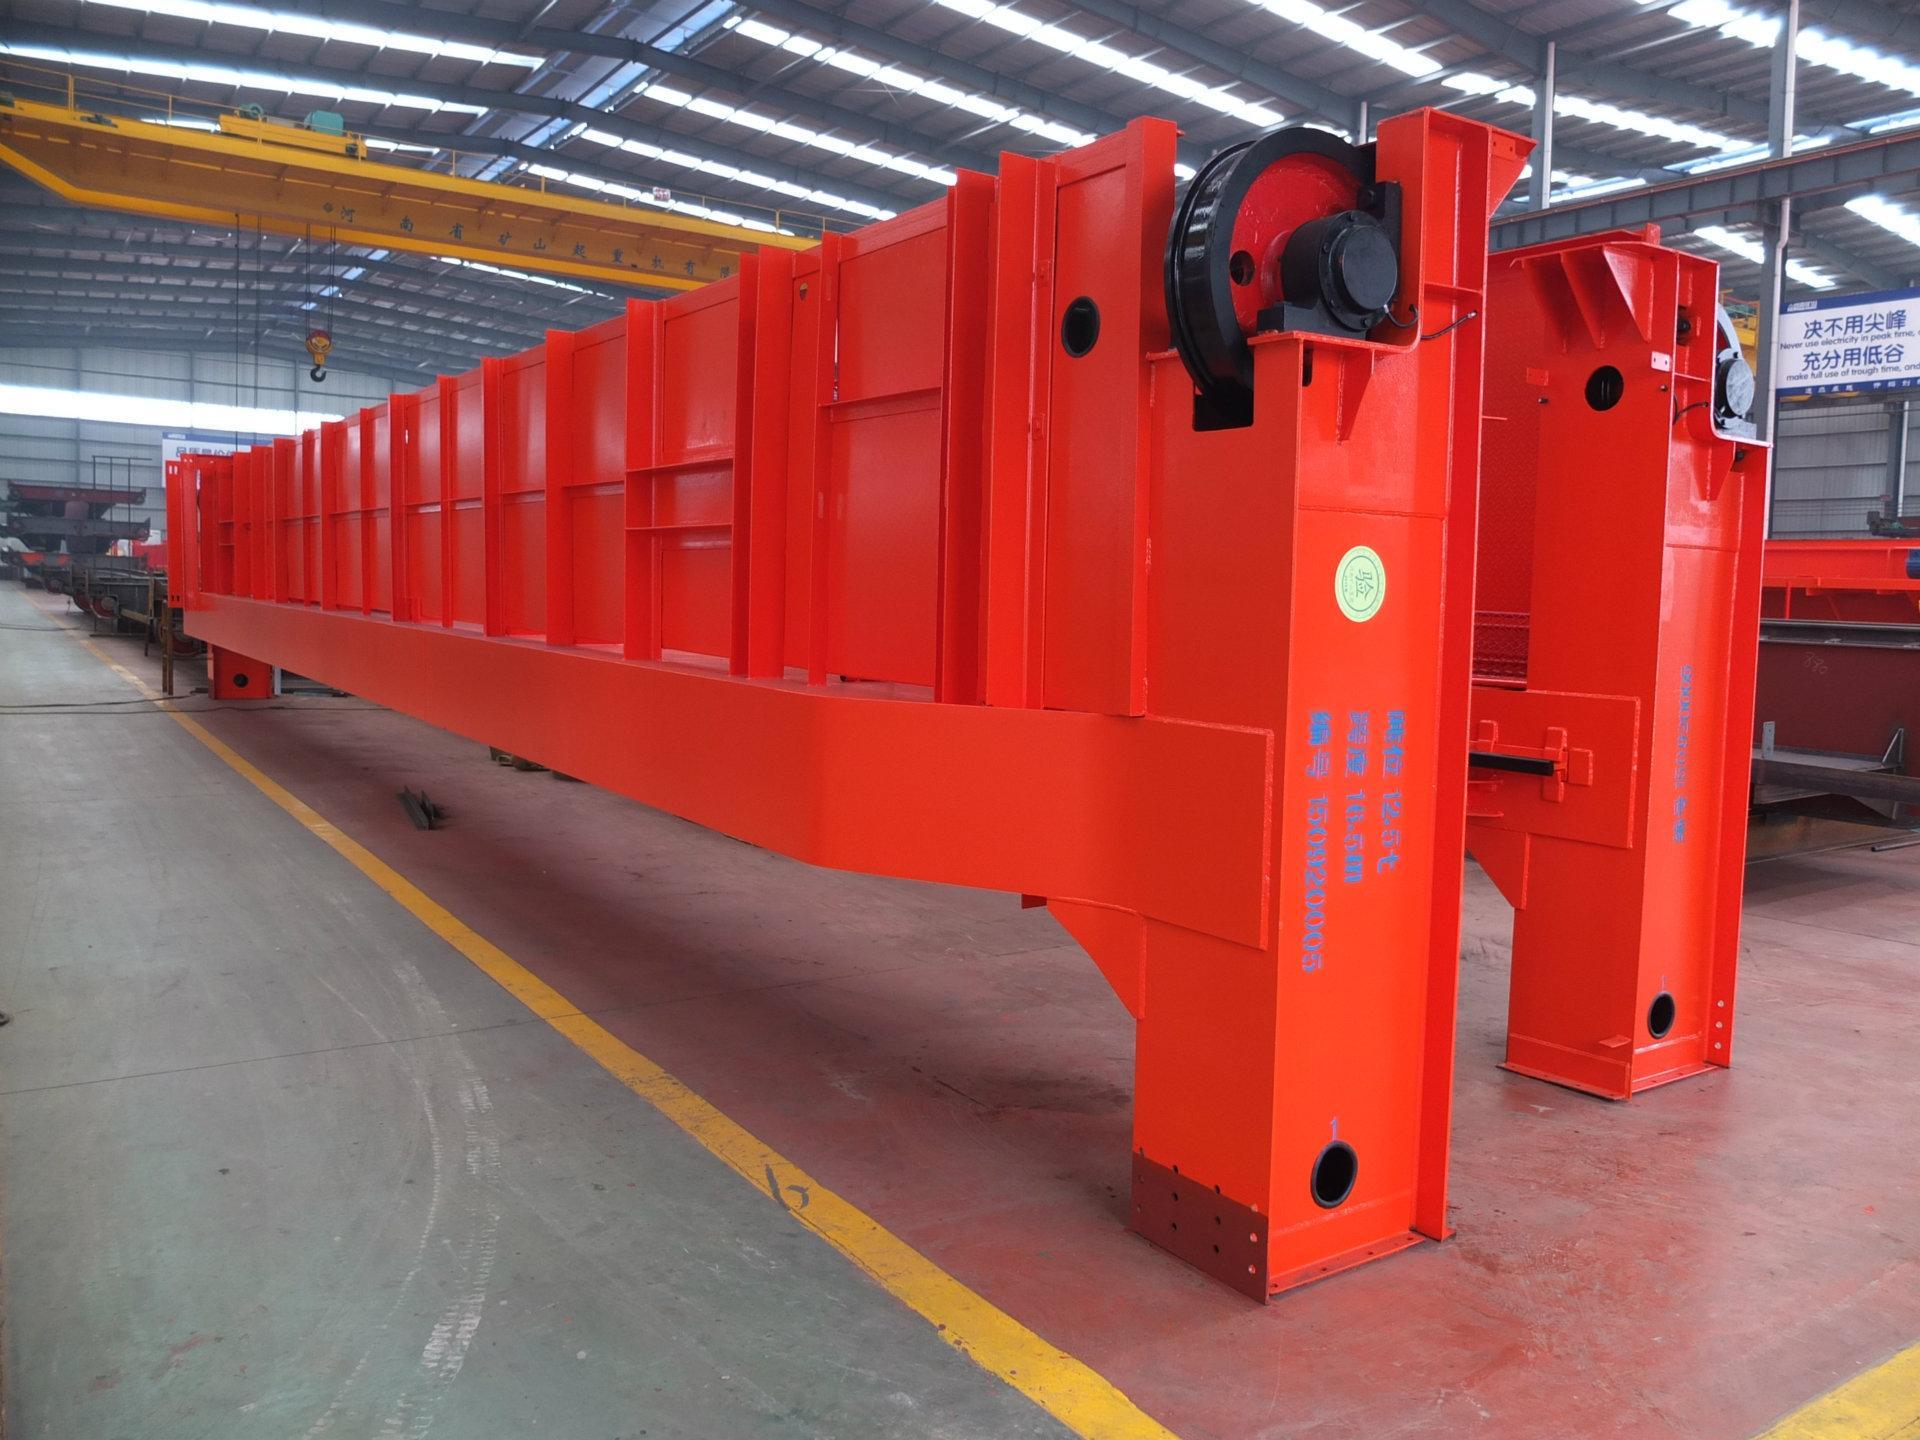 LH型3噸電動葫蘆雙梁起重機LH3T-10.5/11.5/12.5/13.5M 5